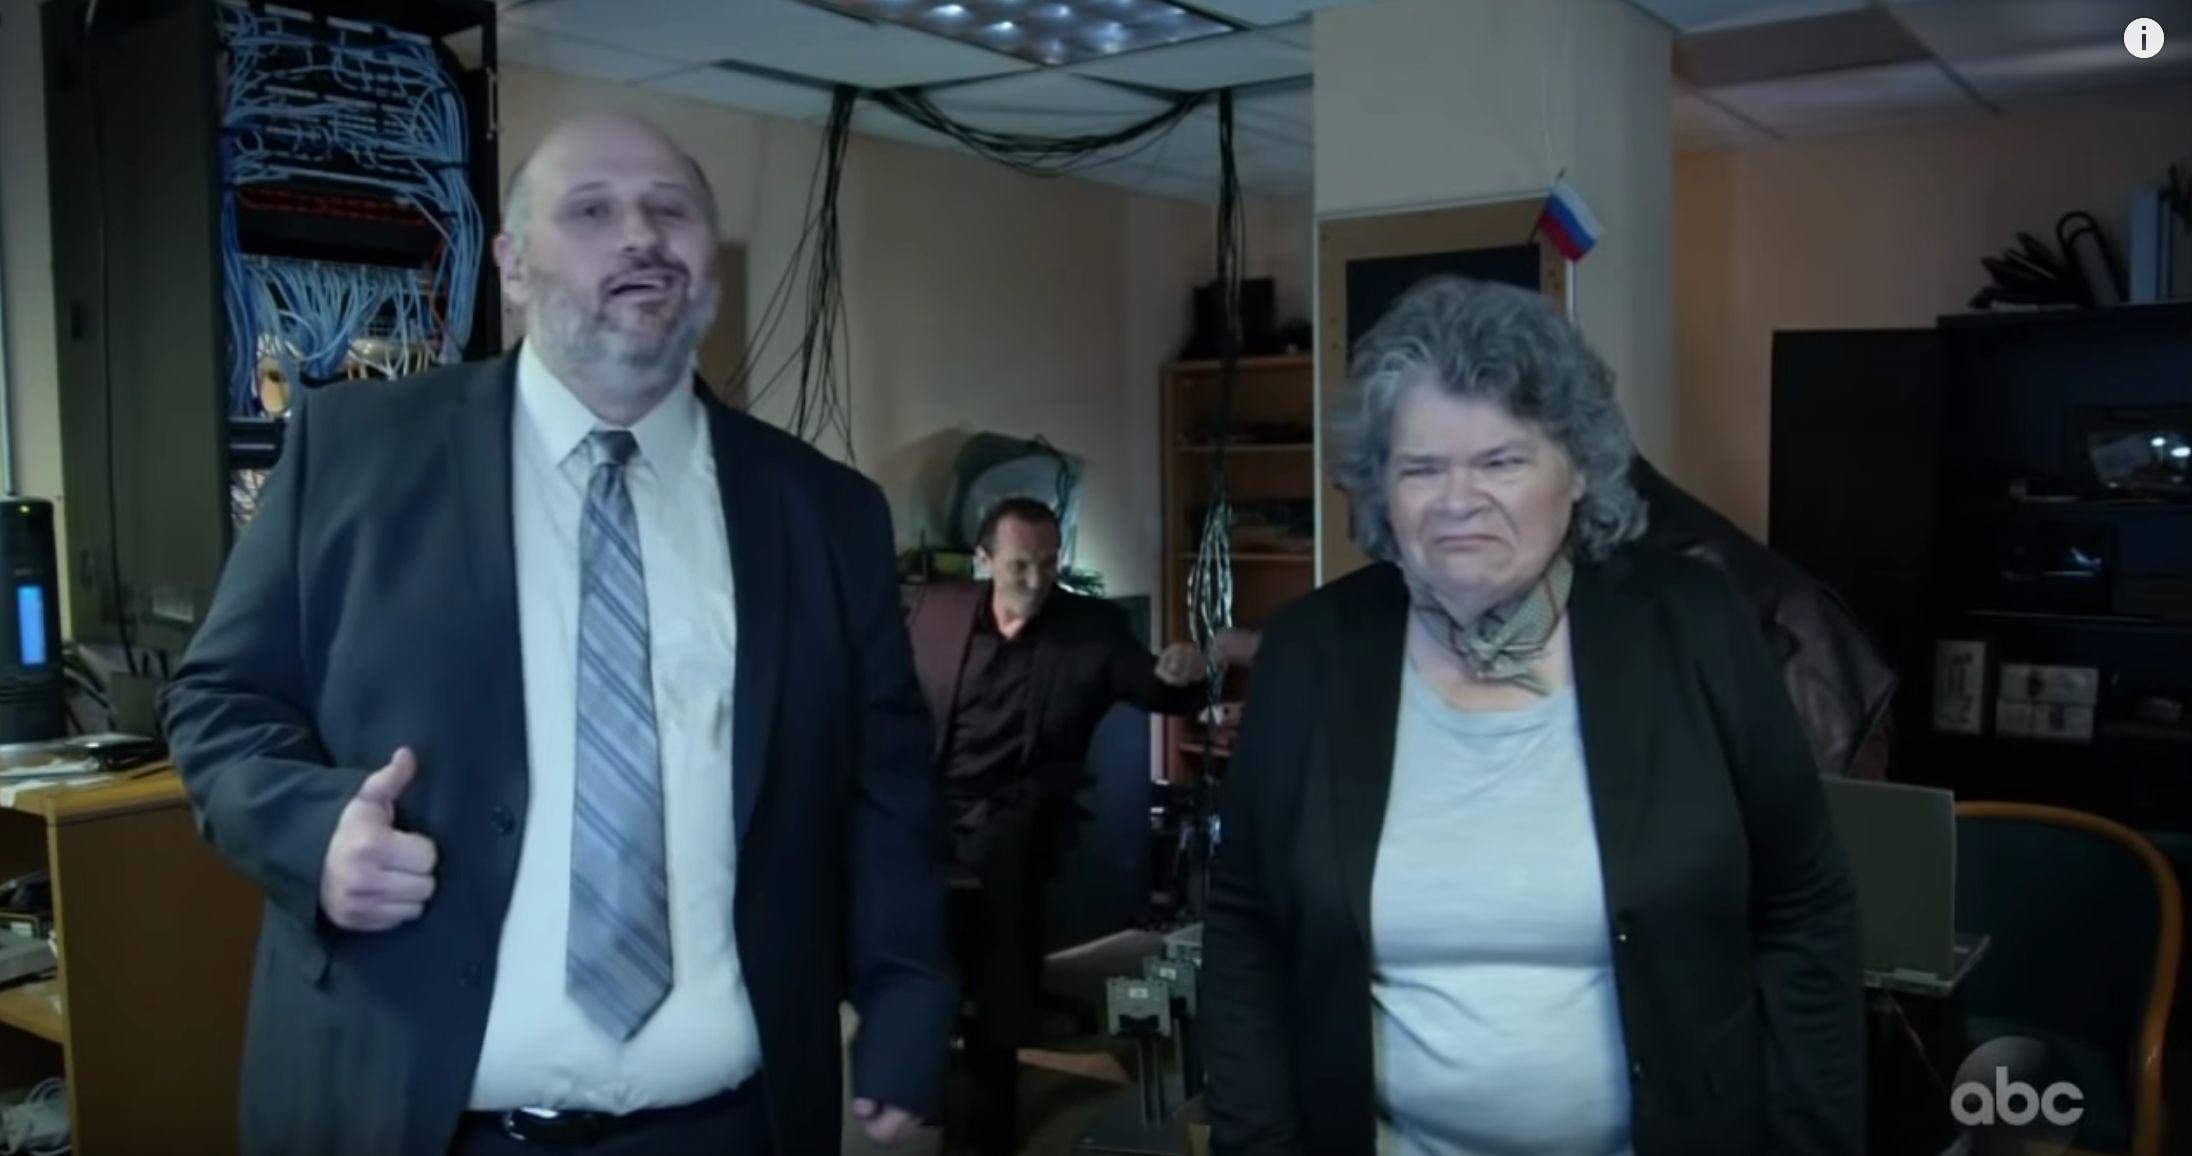 Jimmy Kimmel shows off a Russian troll farm training video